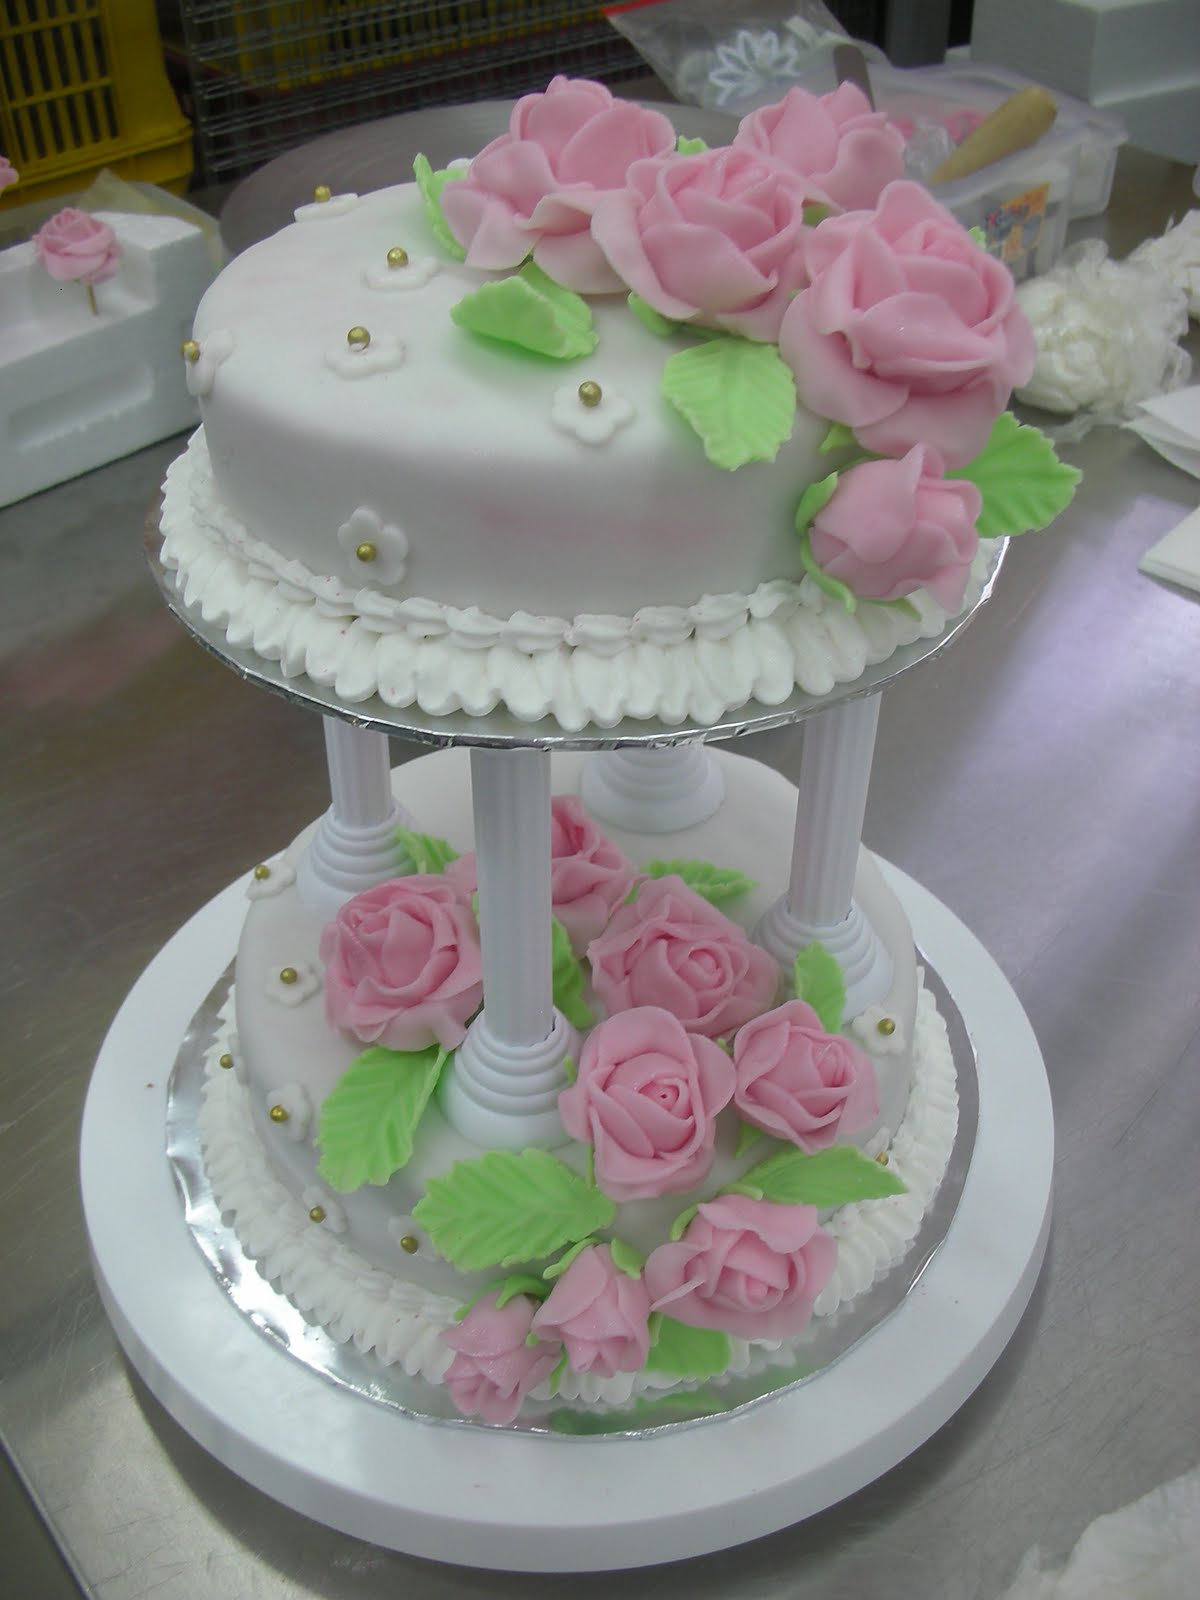 Cake Decorating Wilton : NXXT Creations: Wilton Cake Decorating Course 3